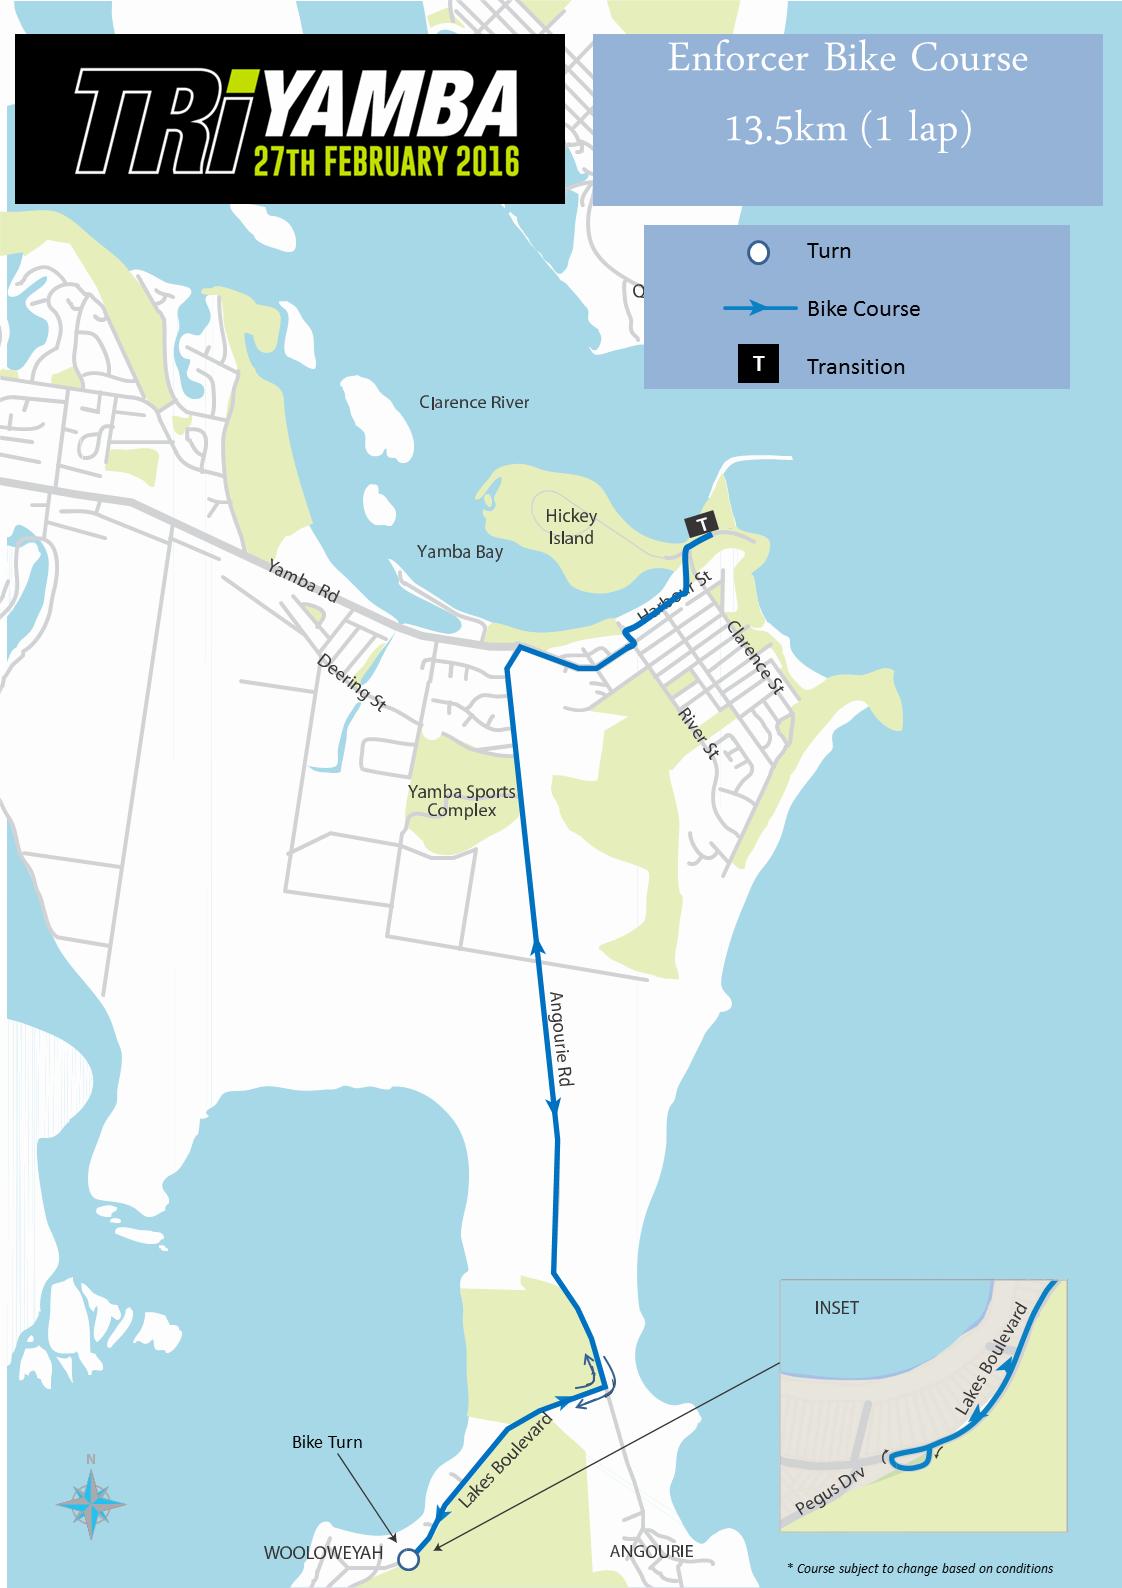 http://www.eliteenergy.com.au/wp-content/uploads/2015/06/Enforcer-Bike-Course-Map-2016.png